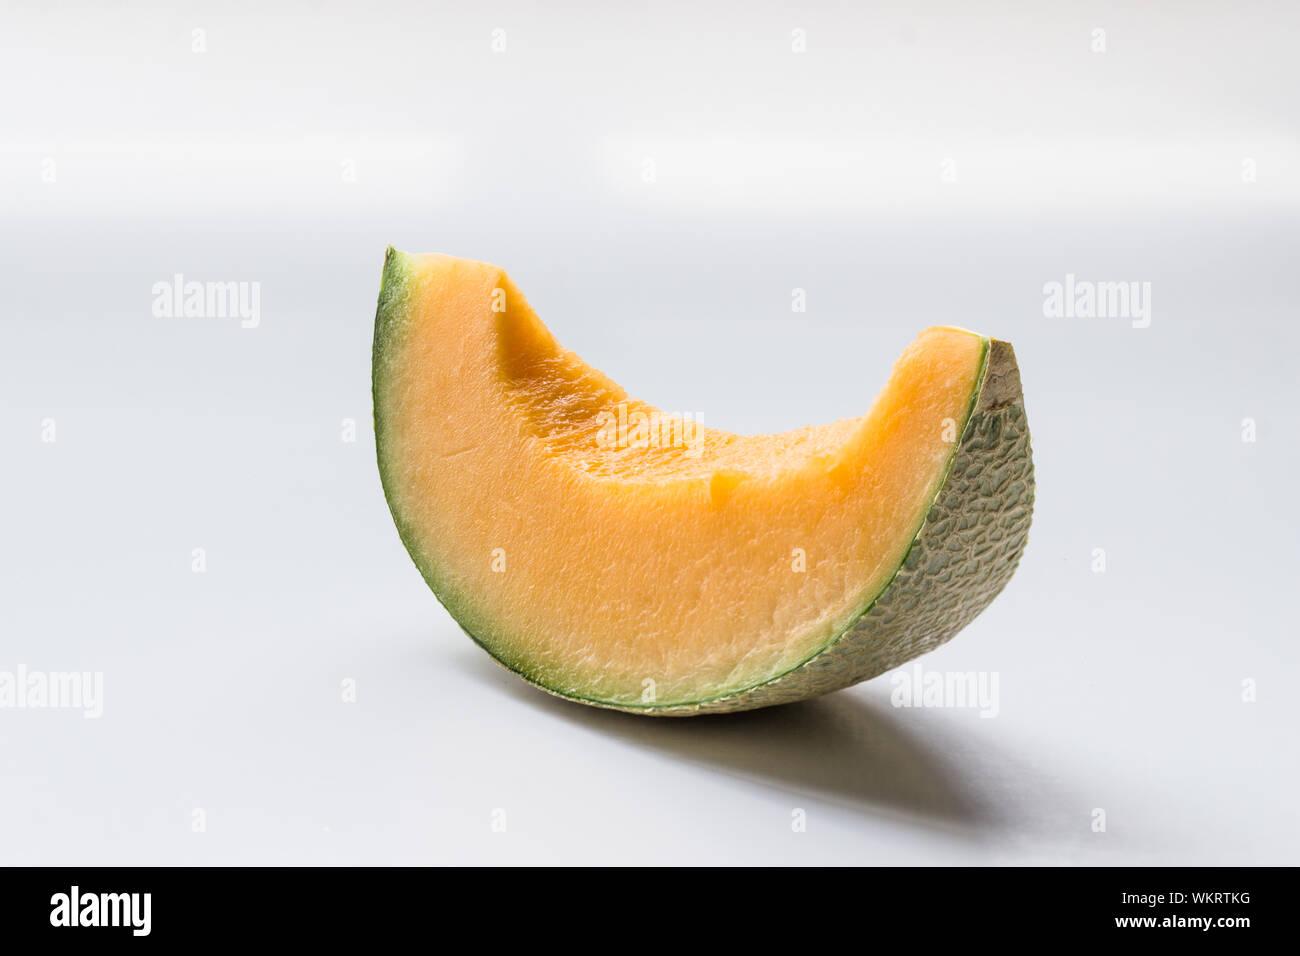 Close Up Of Cantaloupe Slice Against White Background Stock Photo Alamy Cantaloupe slices are food item. alamy